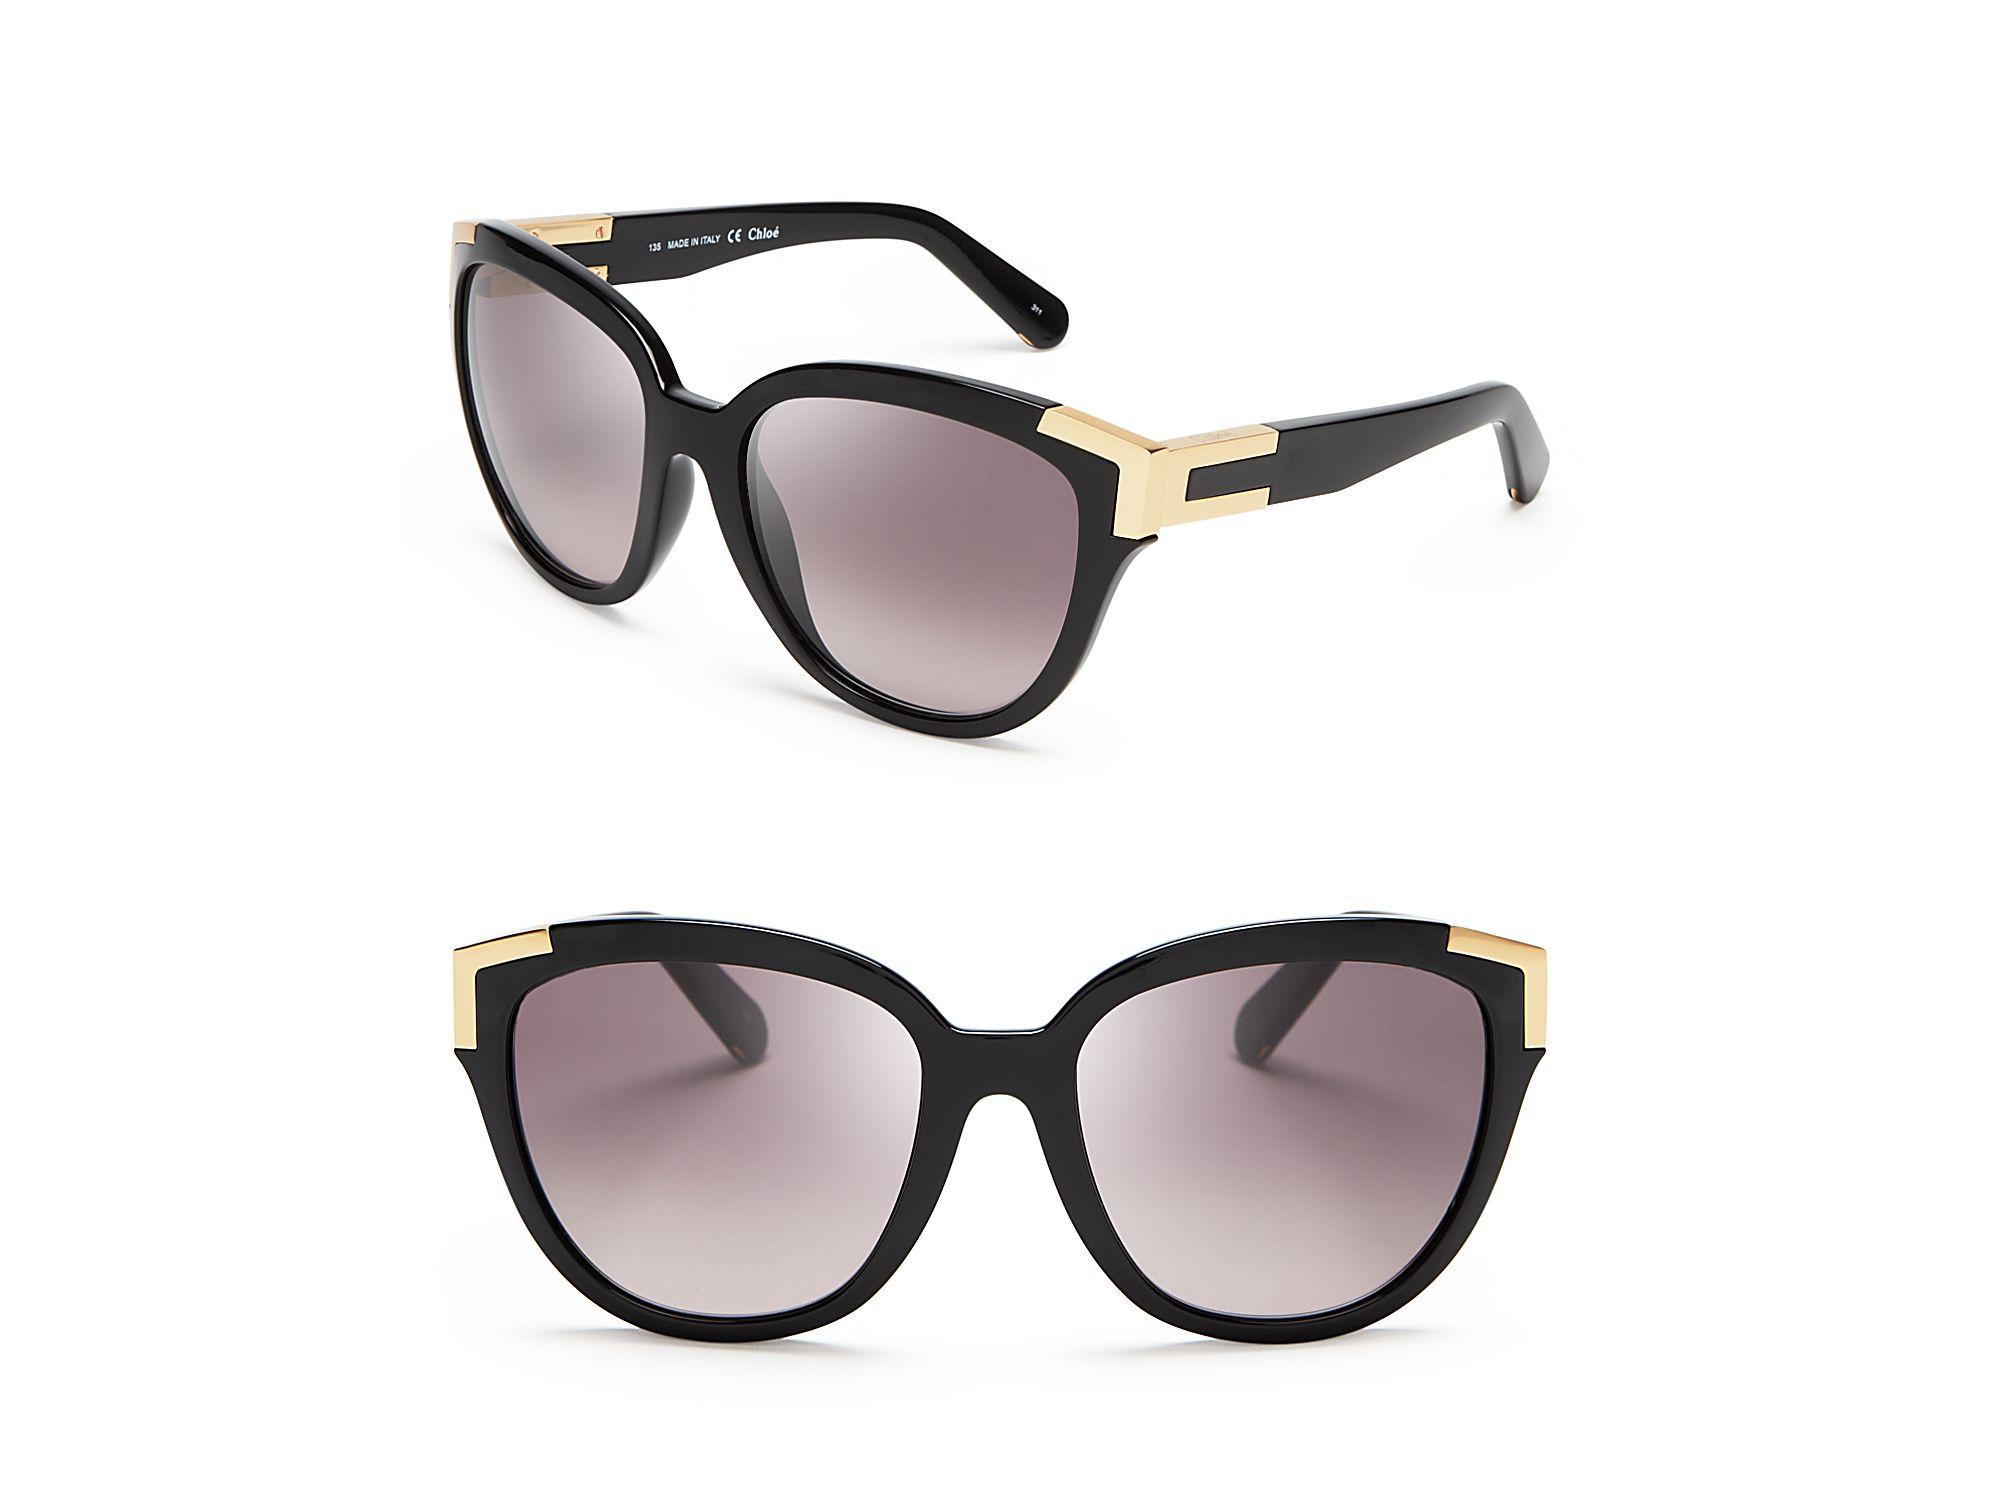 32180b1fe5 Chloé Chloé Oversized Cat Eye Sunglasses in Black - Lyst